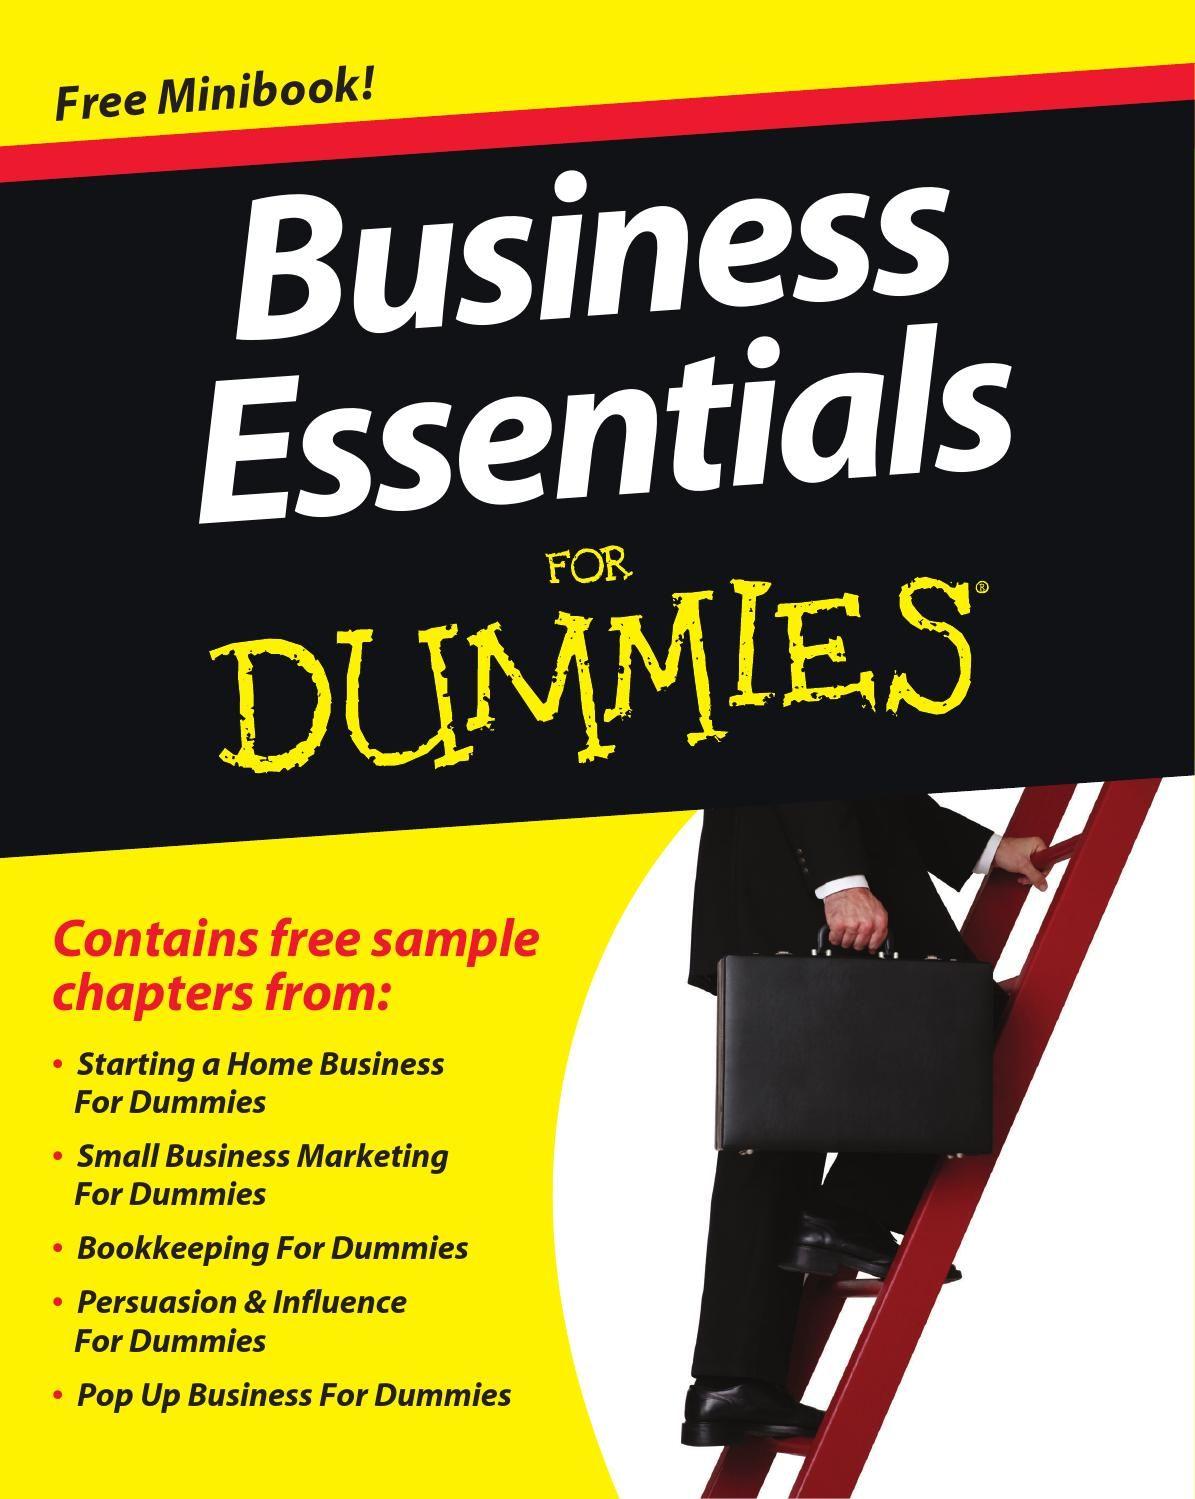 Business Essentials For Dummies Minibook Business